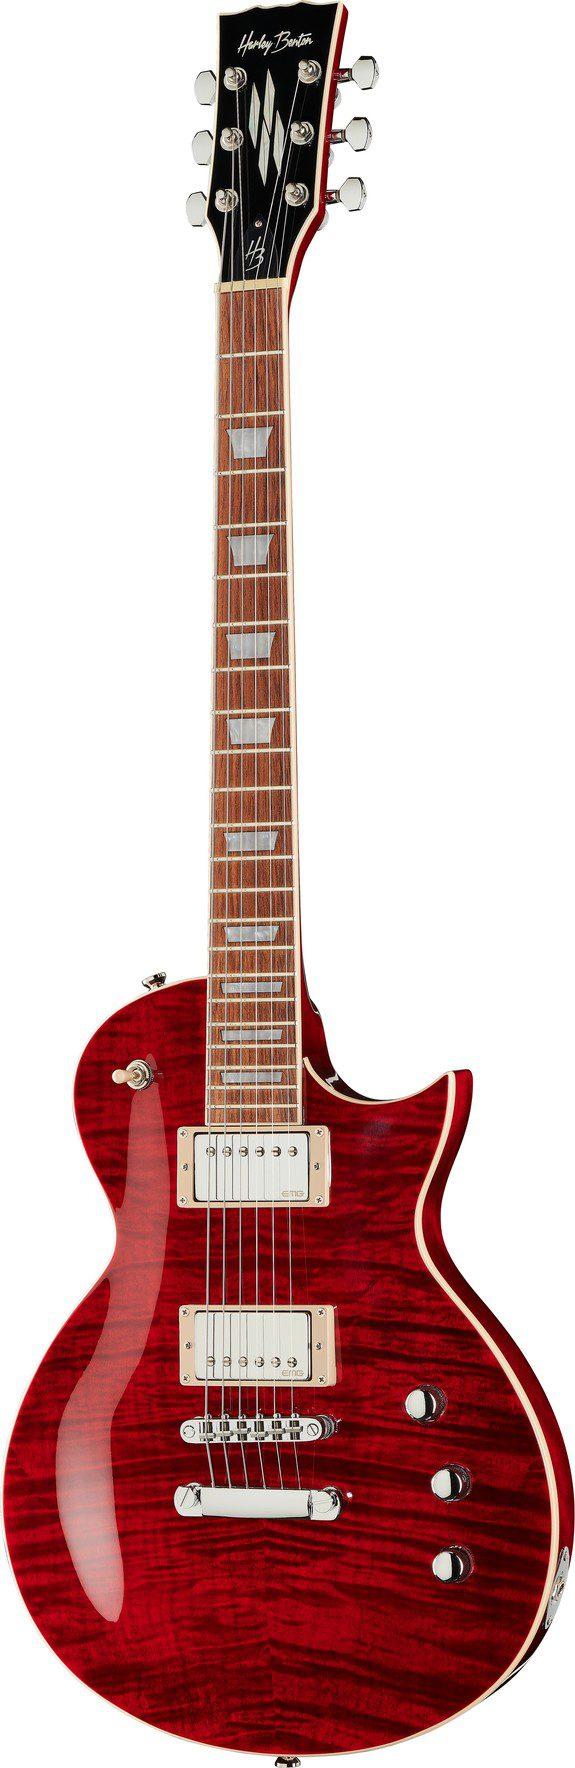 Harley Benton SC-Custom Plus 4